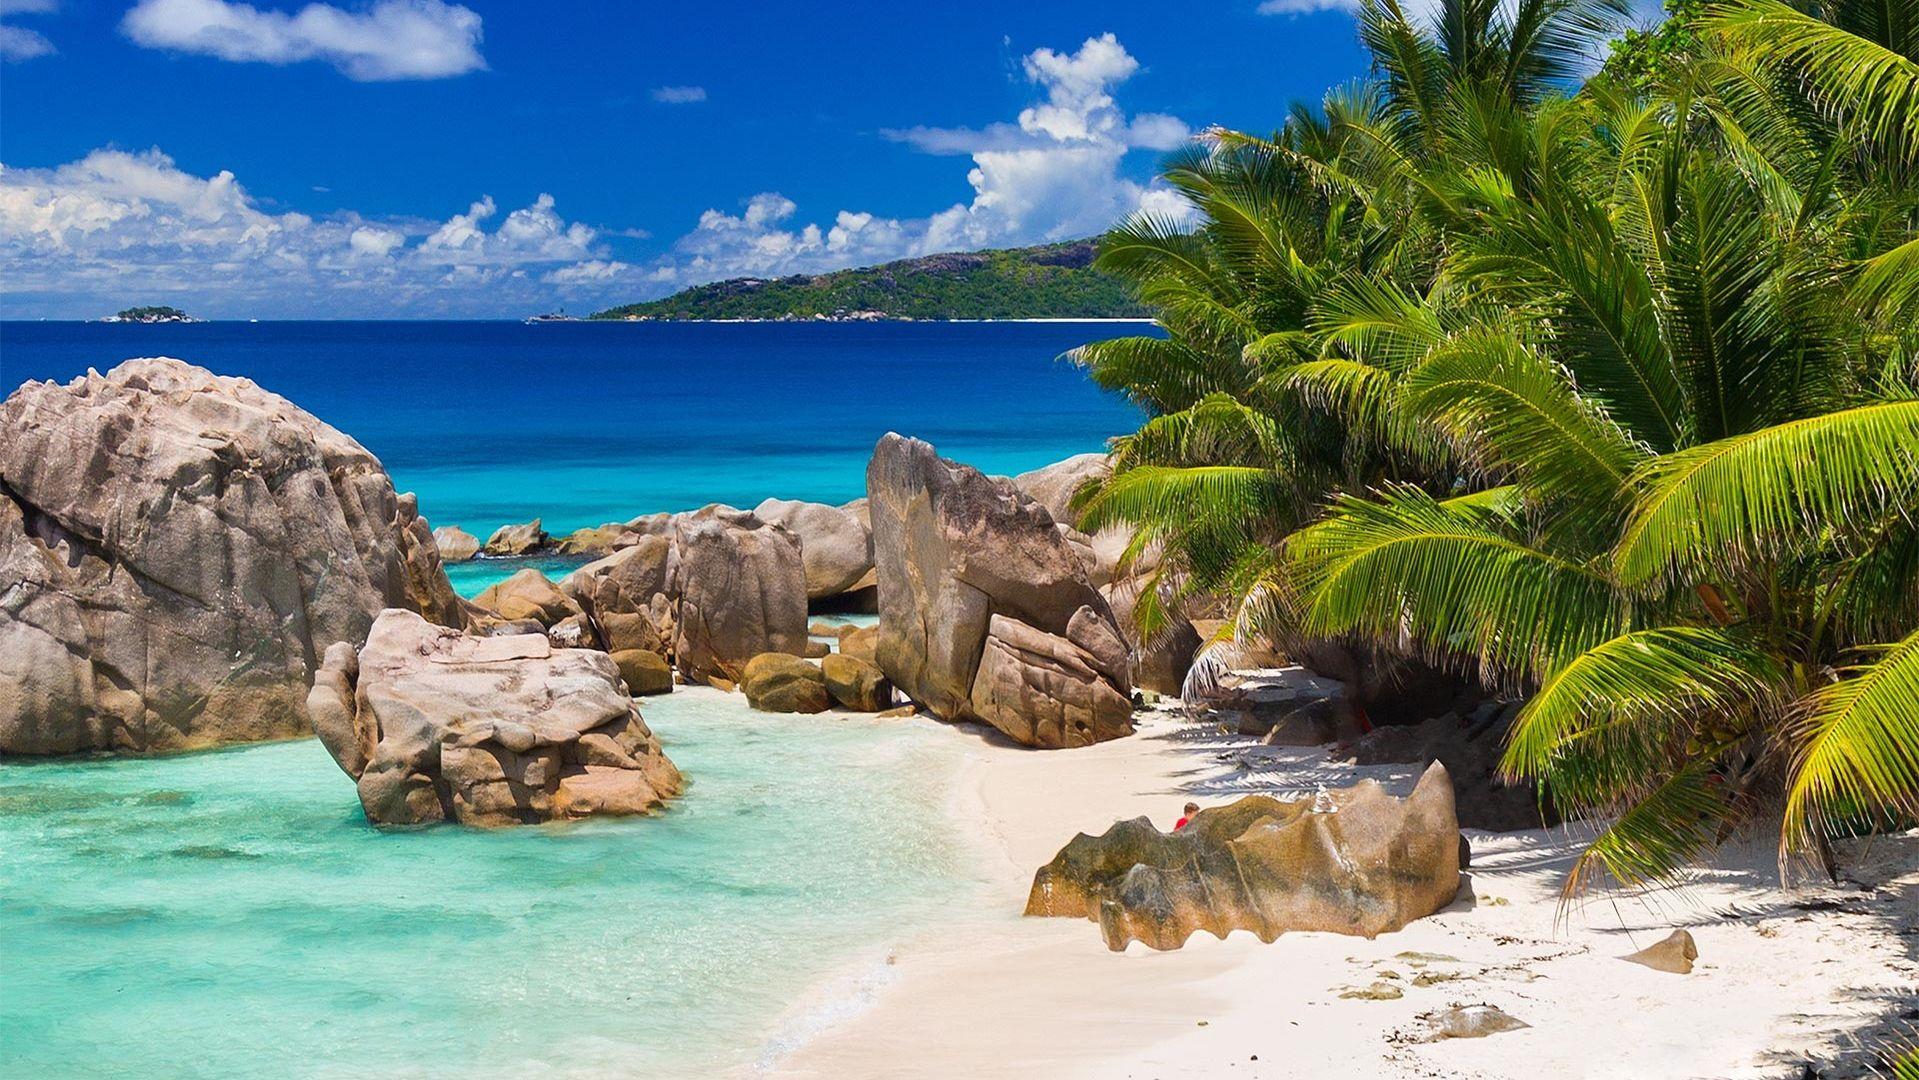 Sejur Luxury Seychelles cu Razvan Pascu, 11 zile - februarie 2022